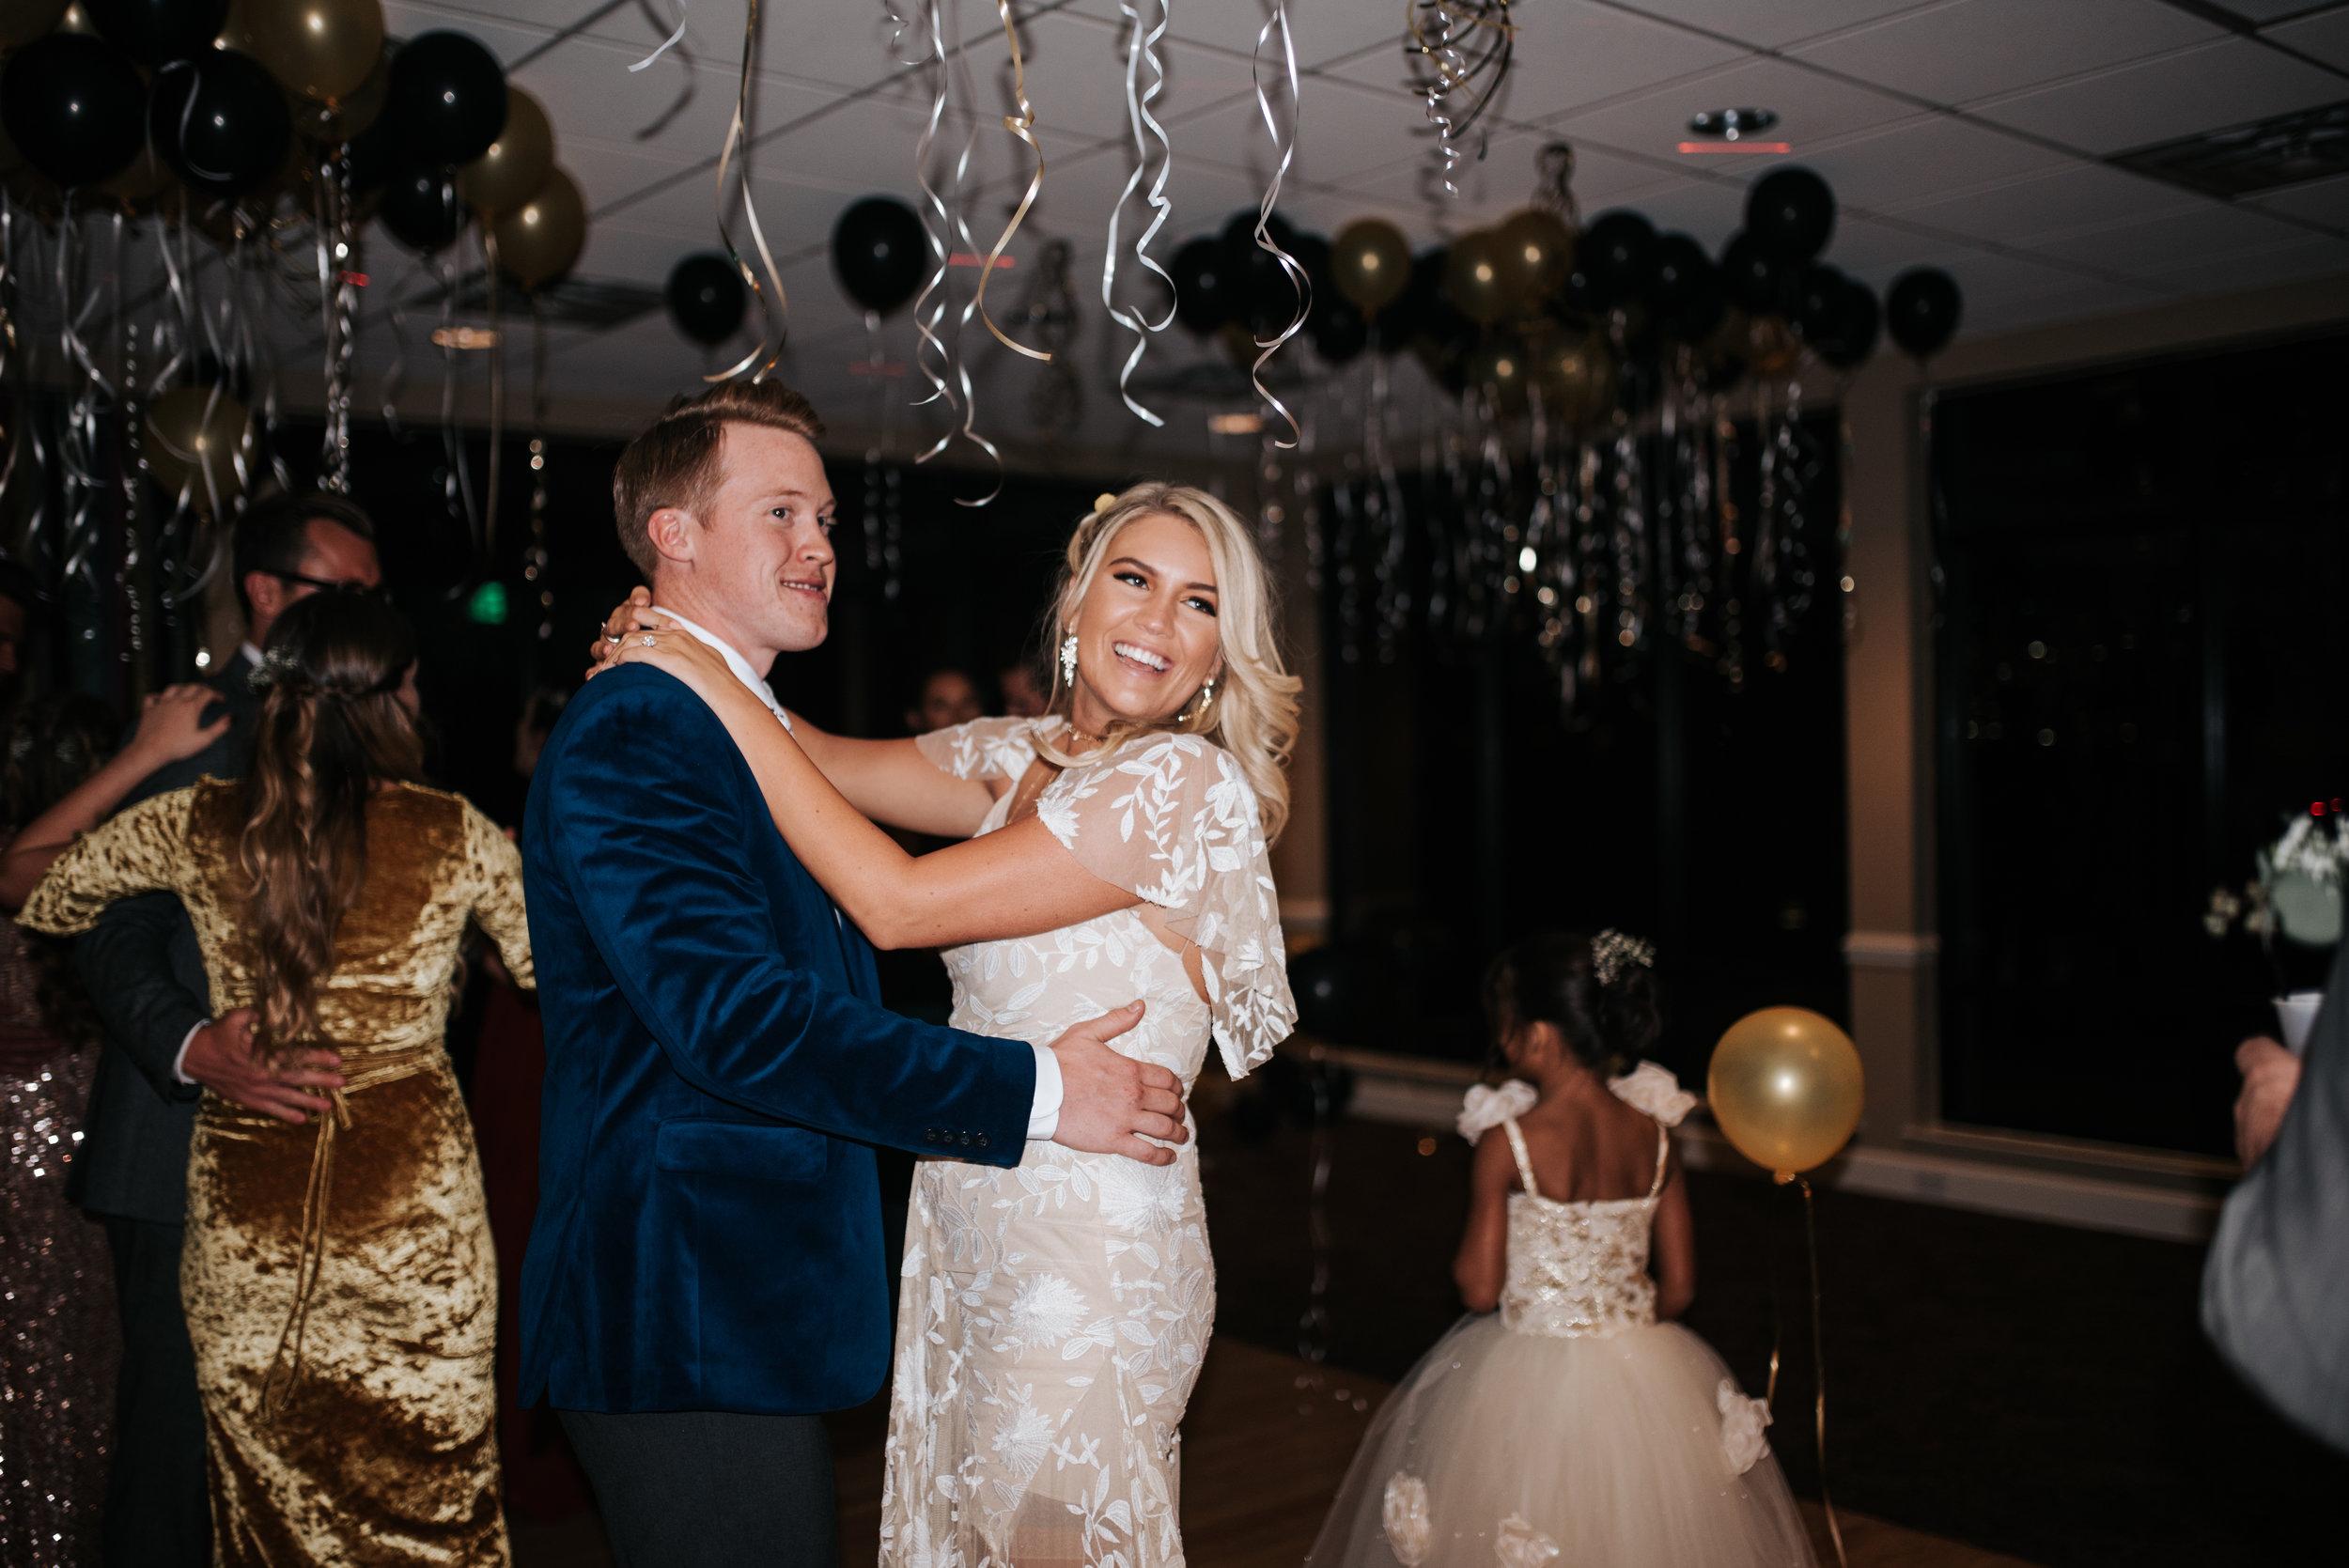 zayda-collin-panama-city-wedding-photography-trippy-bohemian-lisa-frank-wedding-dancing-party-34.jpg